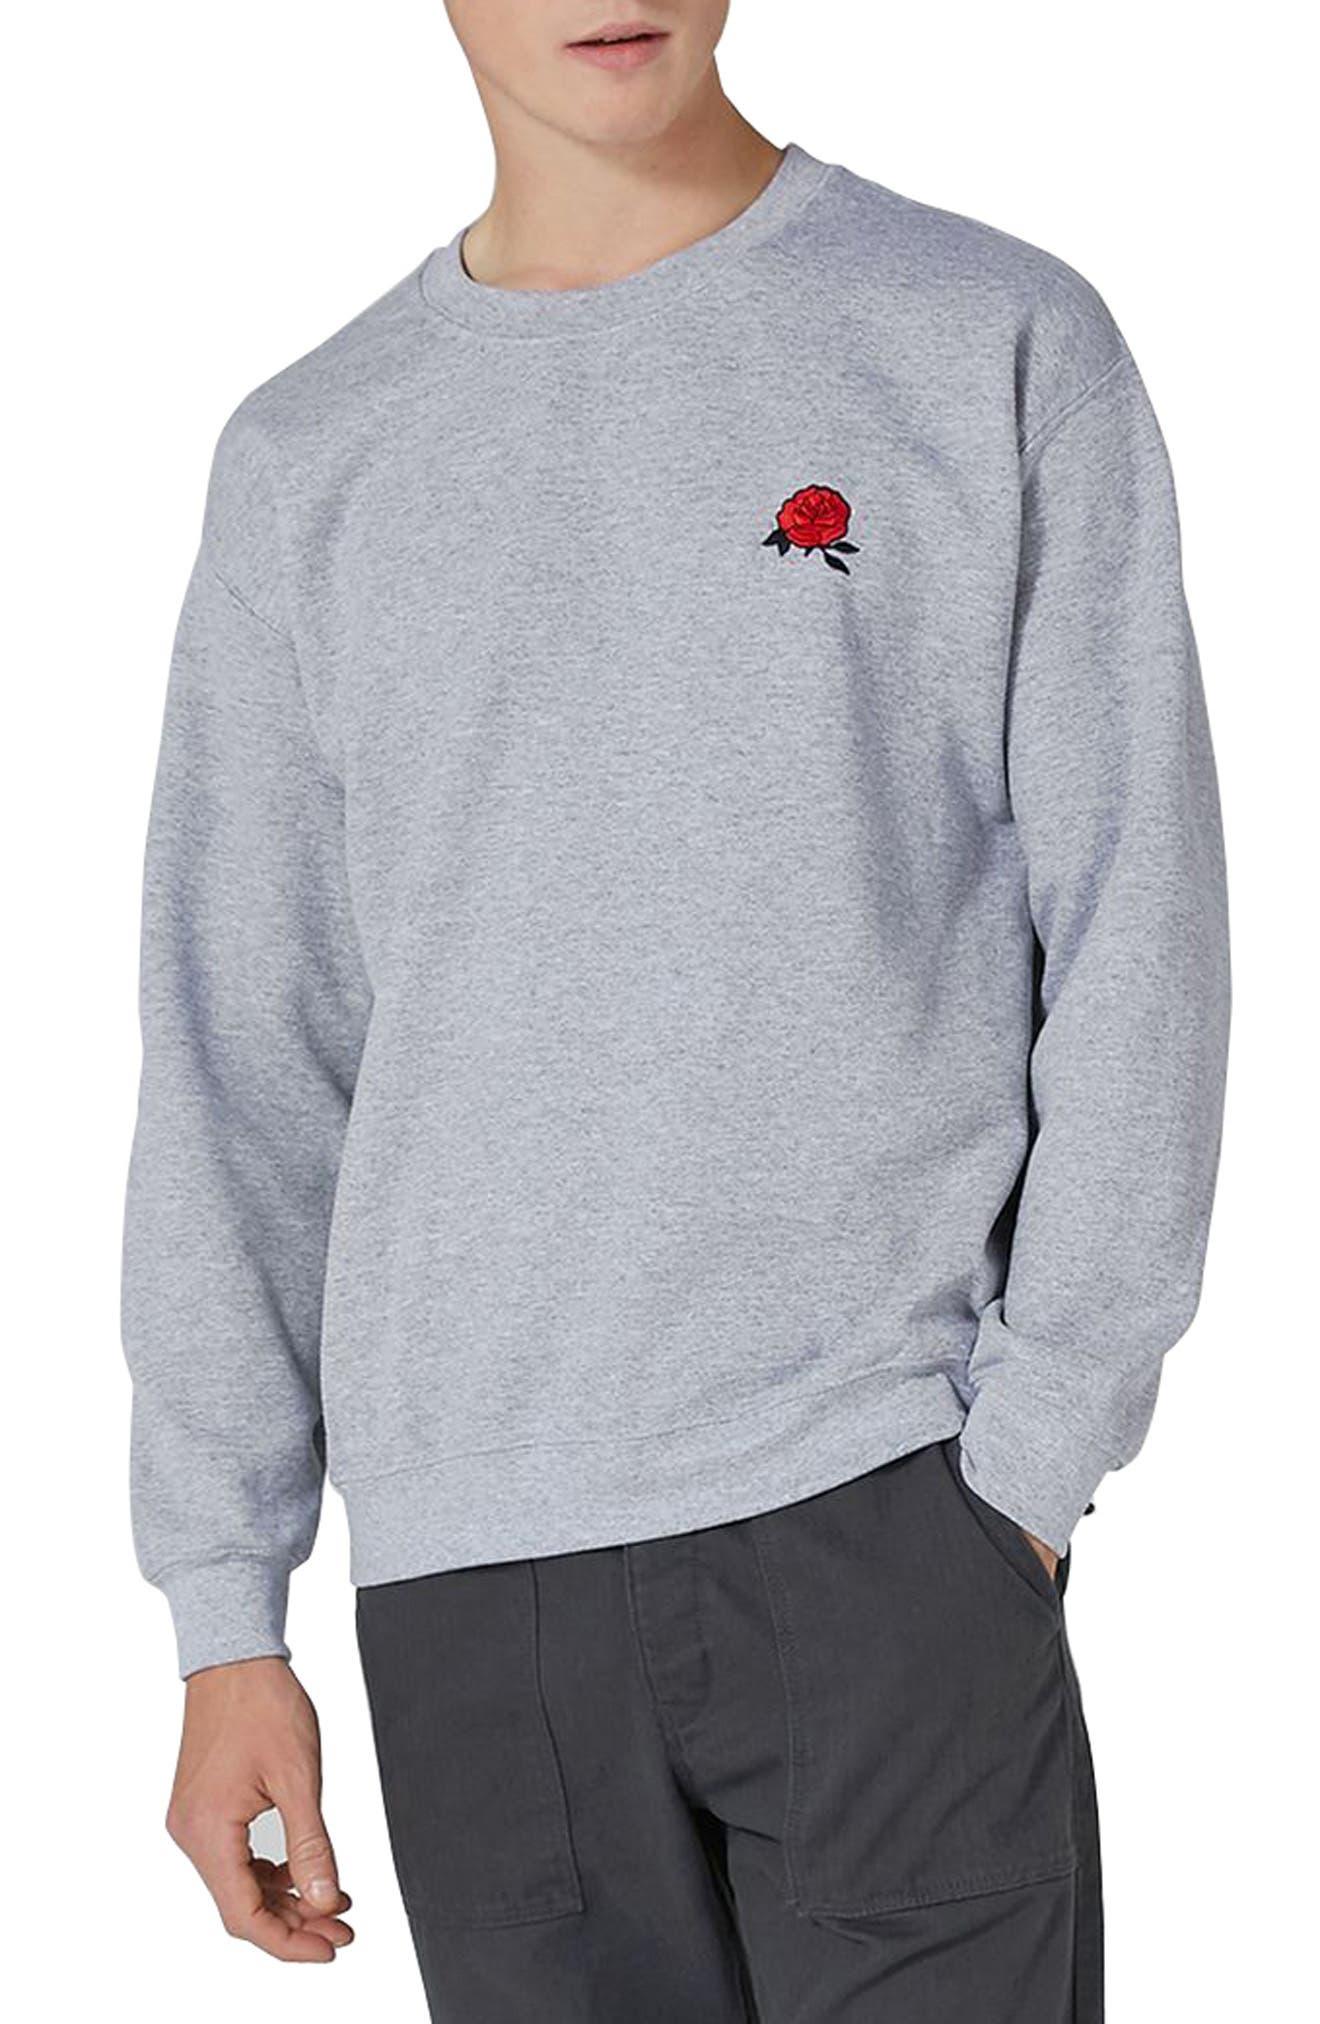 Alternate Image 1 Selected - Topman Rose Embroidered Sweatshirt